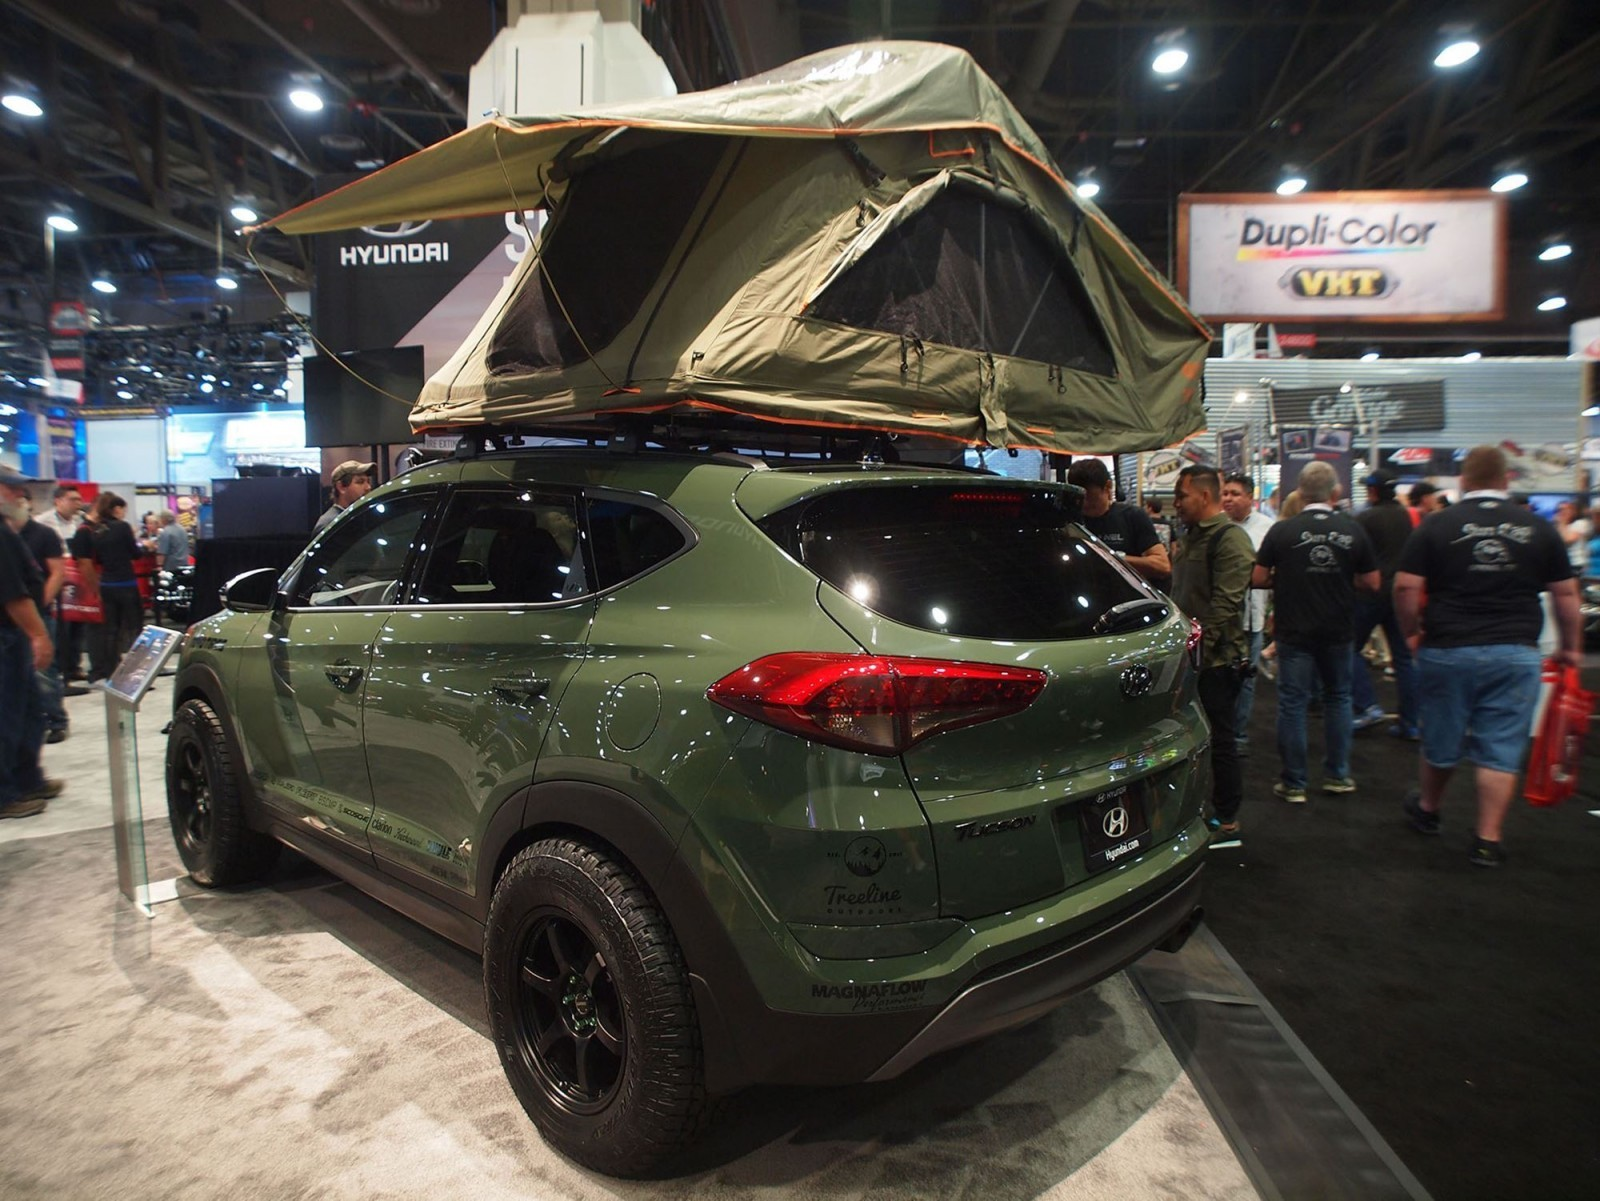 2016 Hyundai Tucson Adventuremobile By John Pangilinan